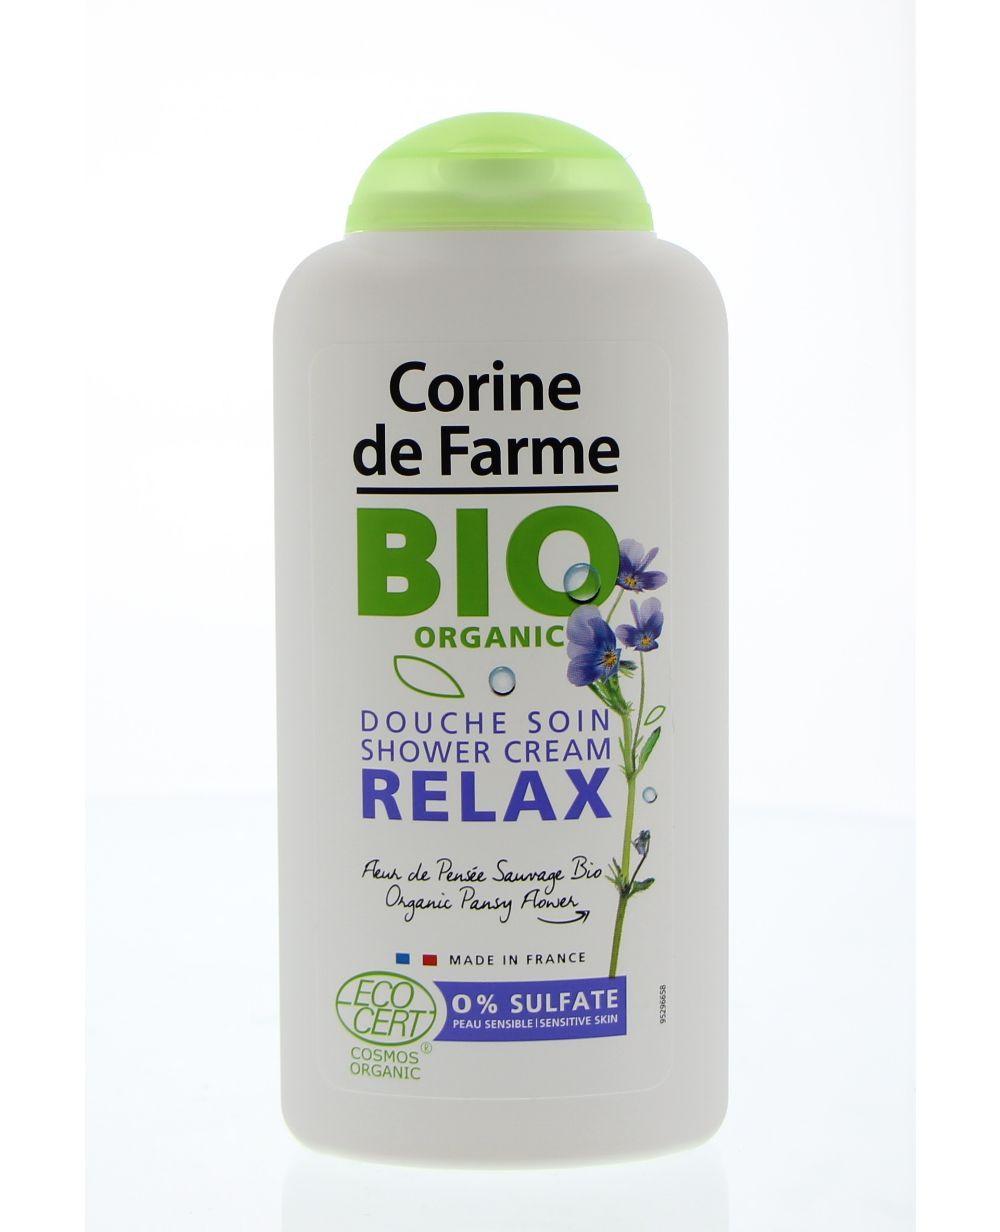 Corine De Farme Bio Organic Shower Cream Relax 300ml